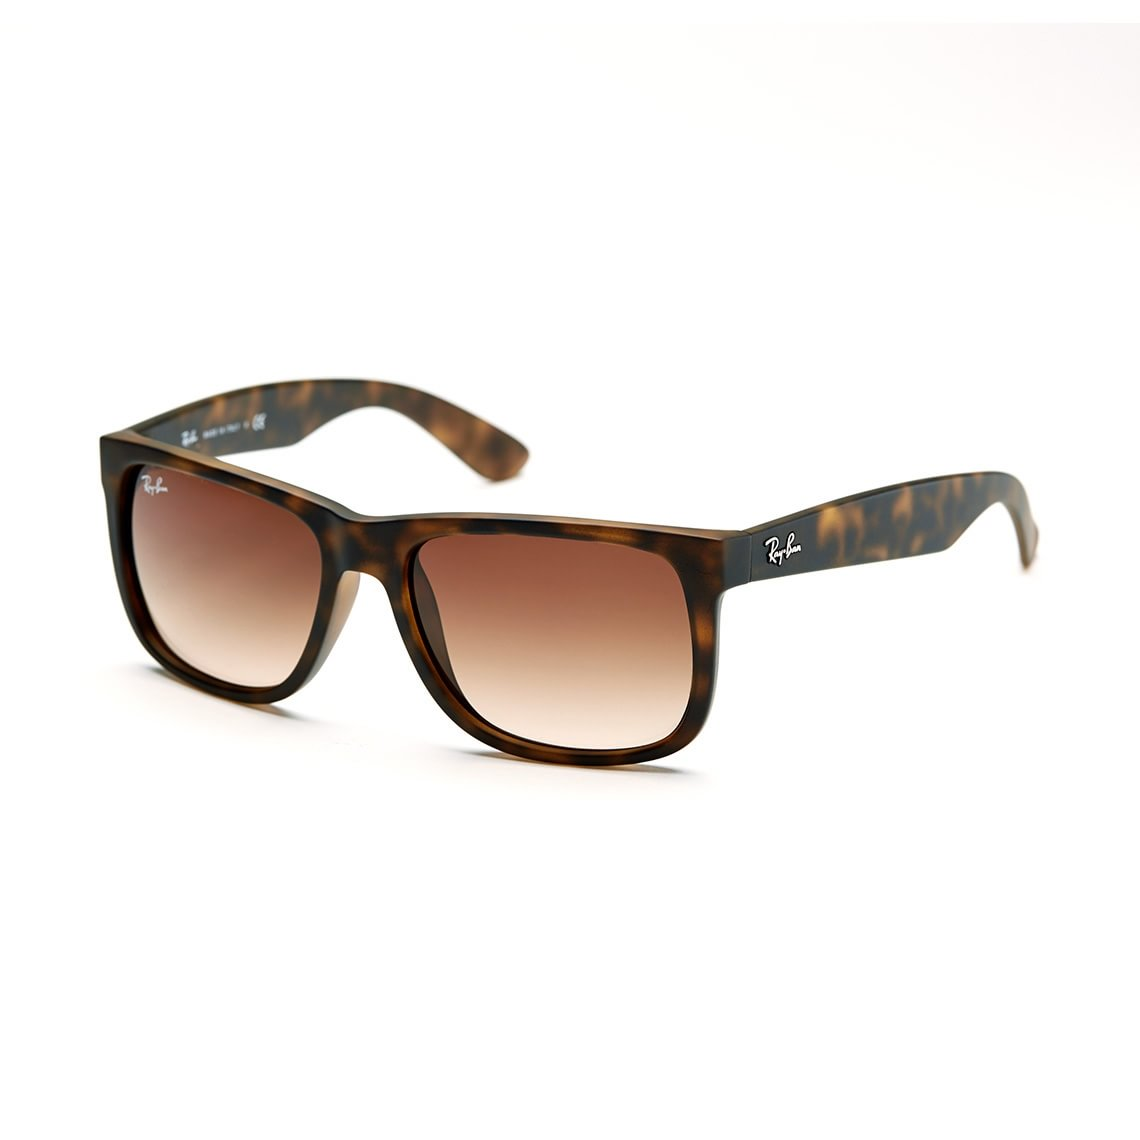 66032ab218f Ray-Ban Wayfarer Justin Unisex Sunglasses RB4165-710 13-55